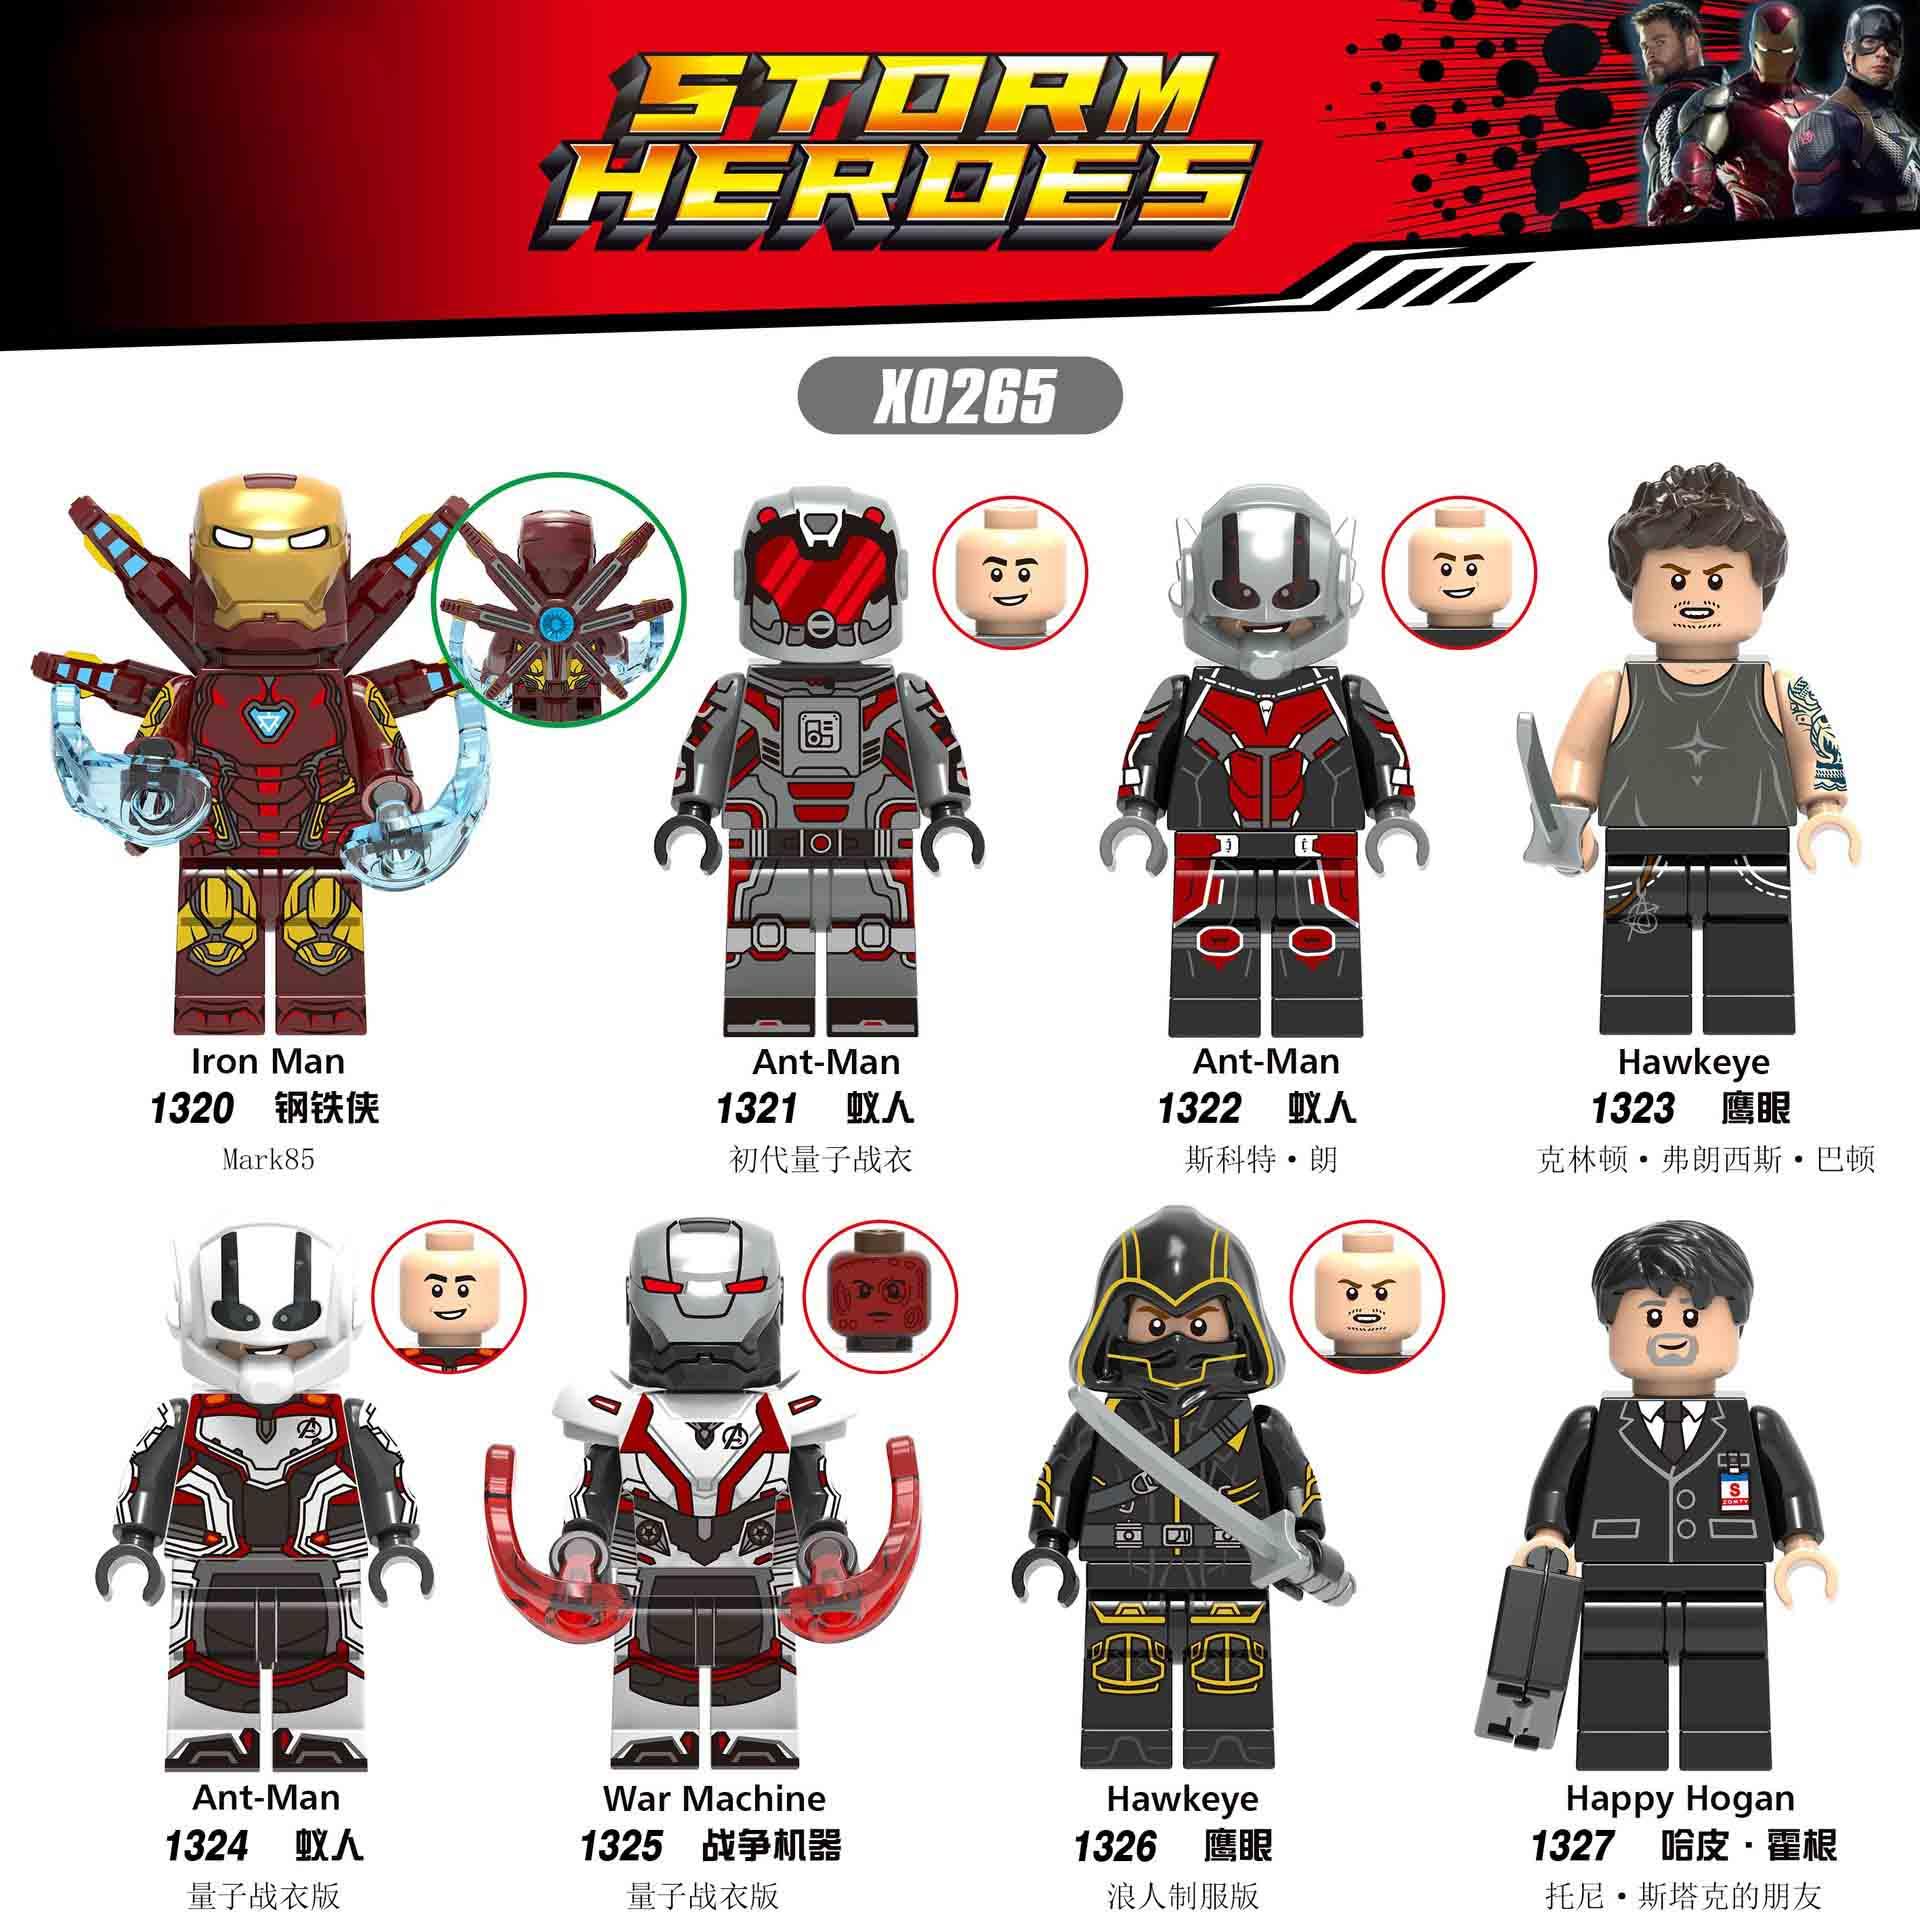 X0265 LegoING Toy Super Hero AvengersING Iron Man Ant Man War Machine Hawkeye Hapy Hogan Building Blocks Human Collection Gift